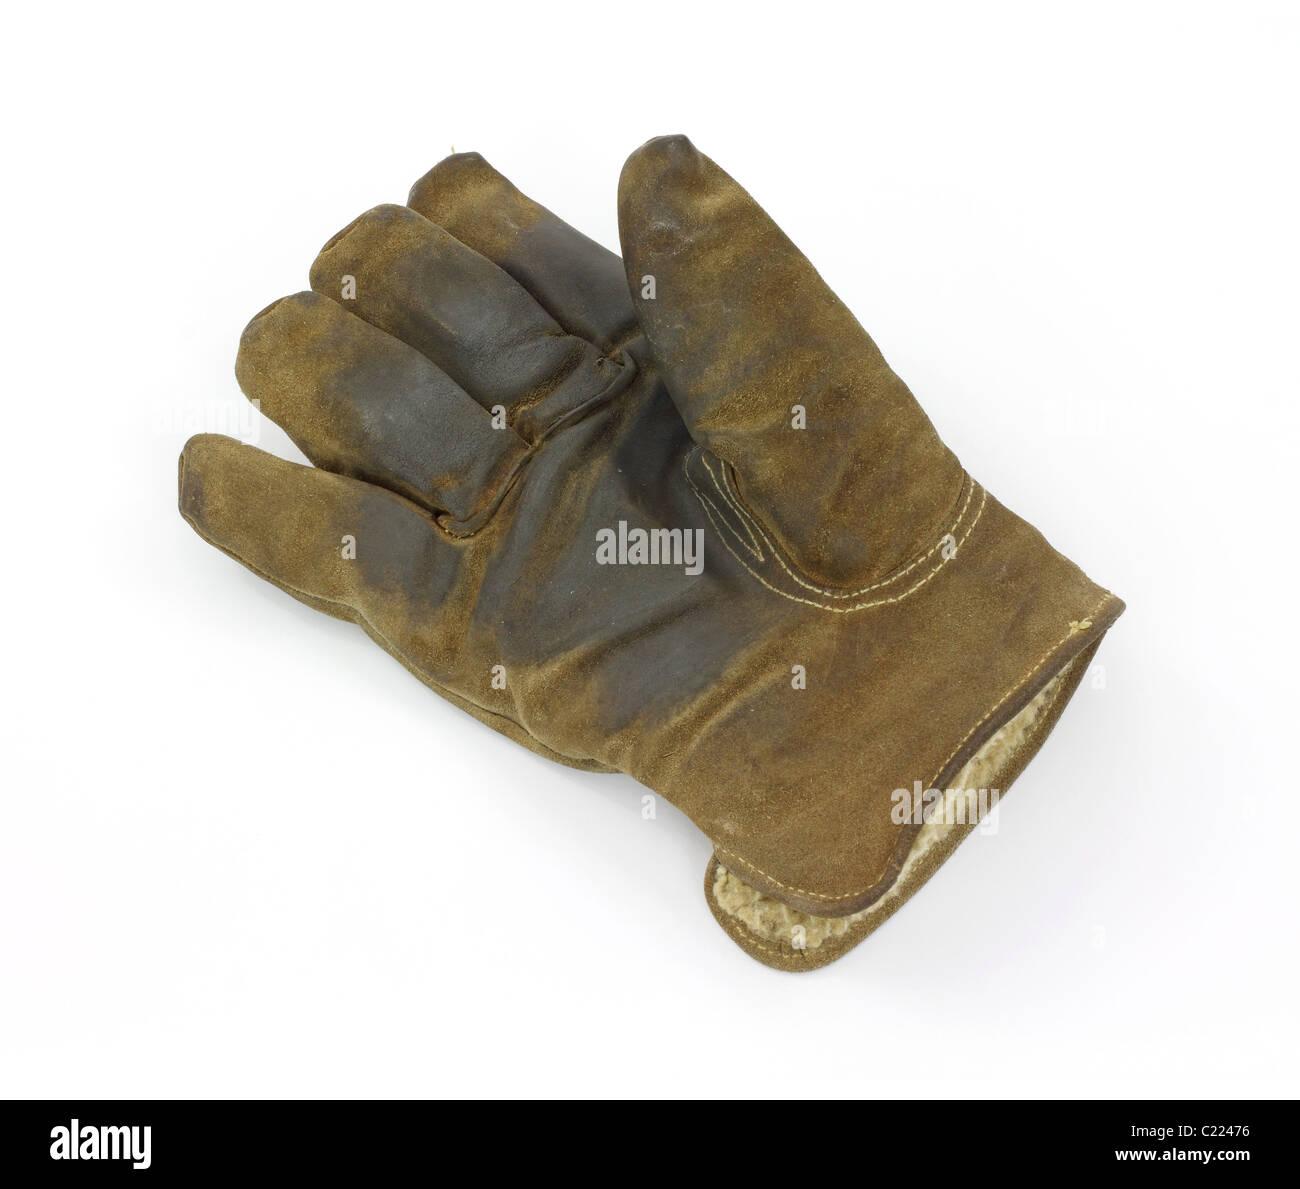 Worn work glove - Stock Image